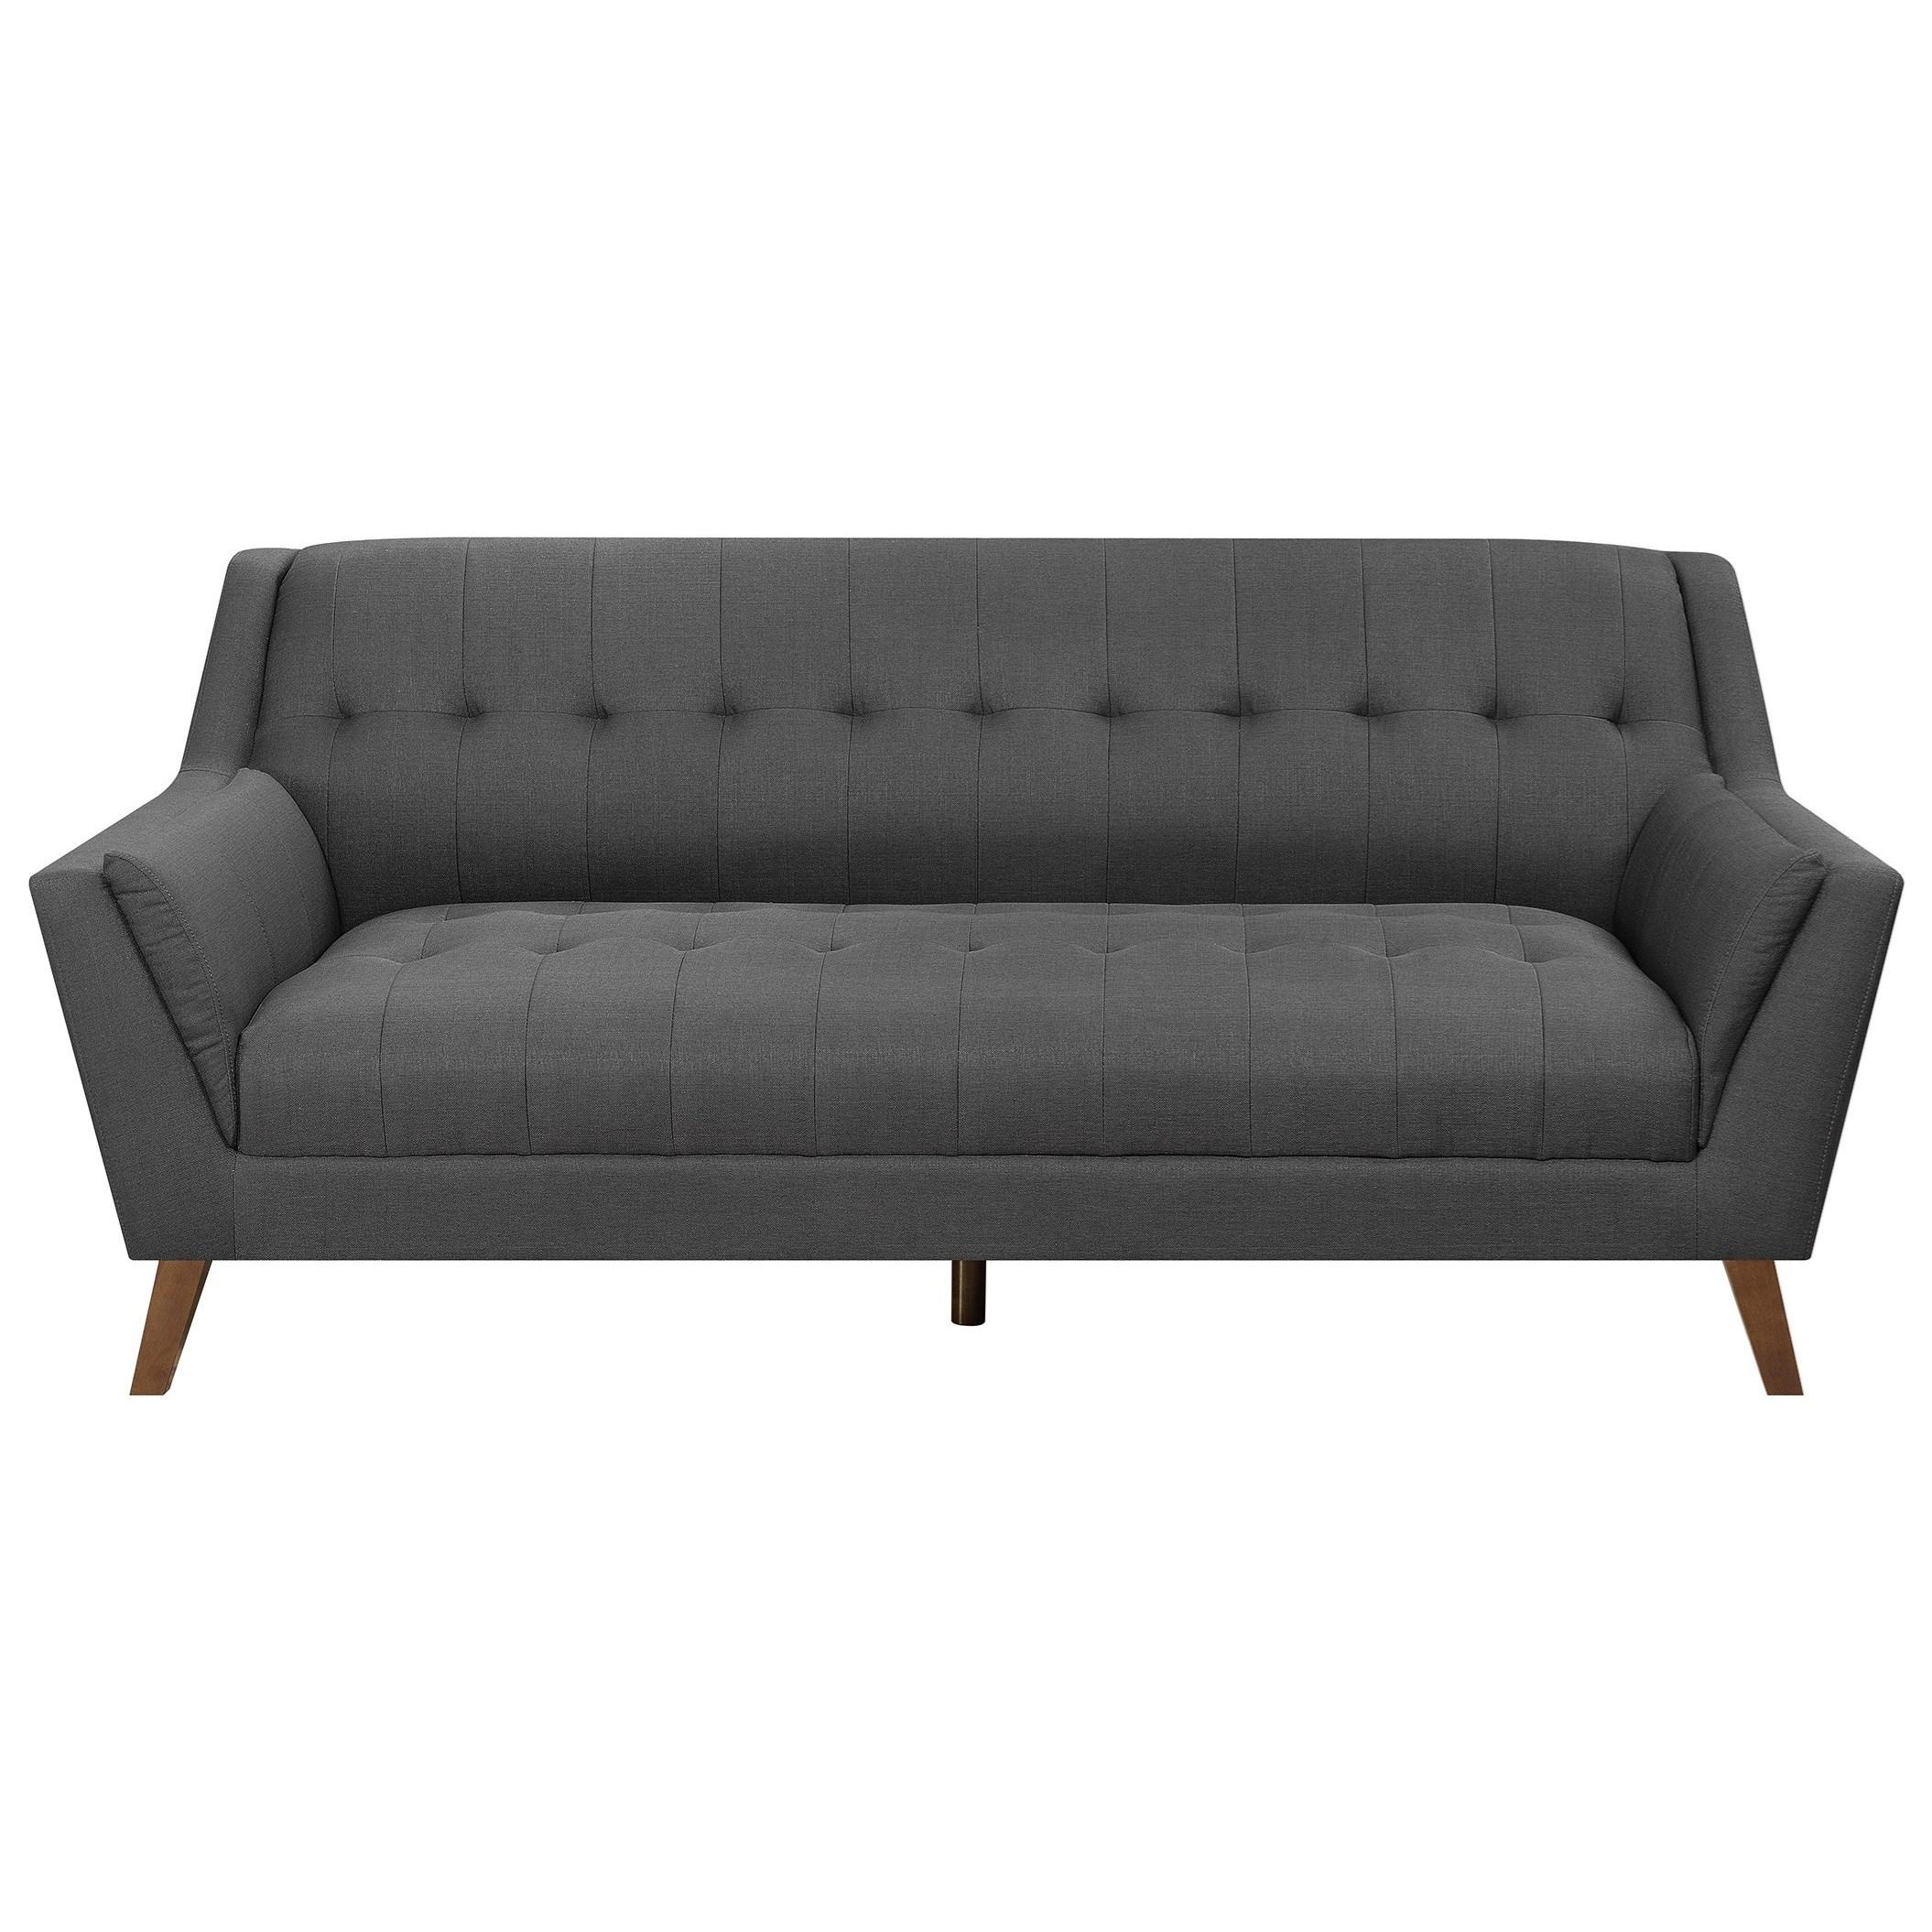 Binetti Sofa by Emerald at Northeast Factory Direct